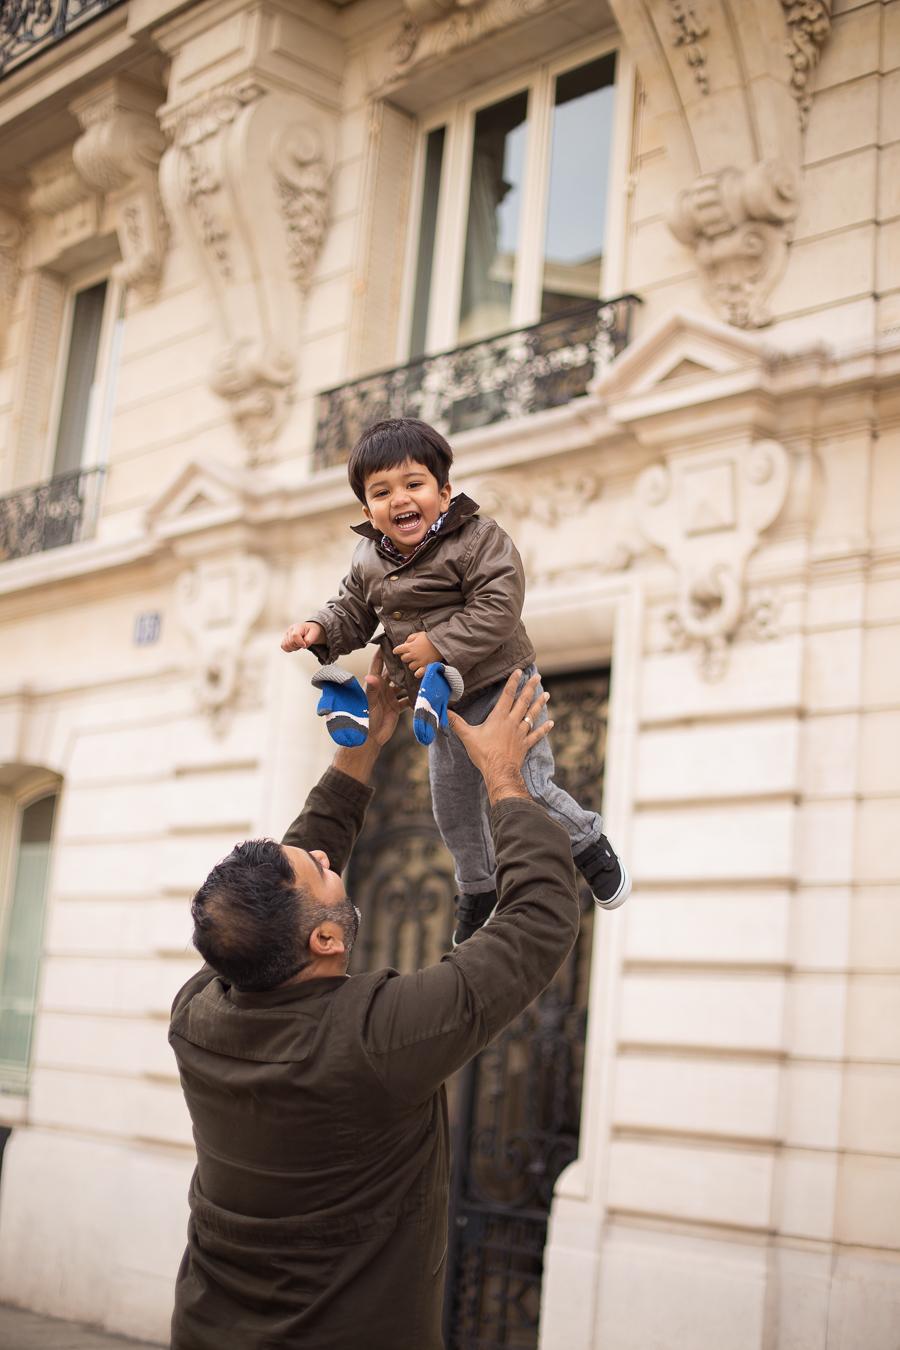 paris-france-lifestyle-maternity-family-photographer-jardin-du-luxembourg_002.jpg